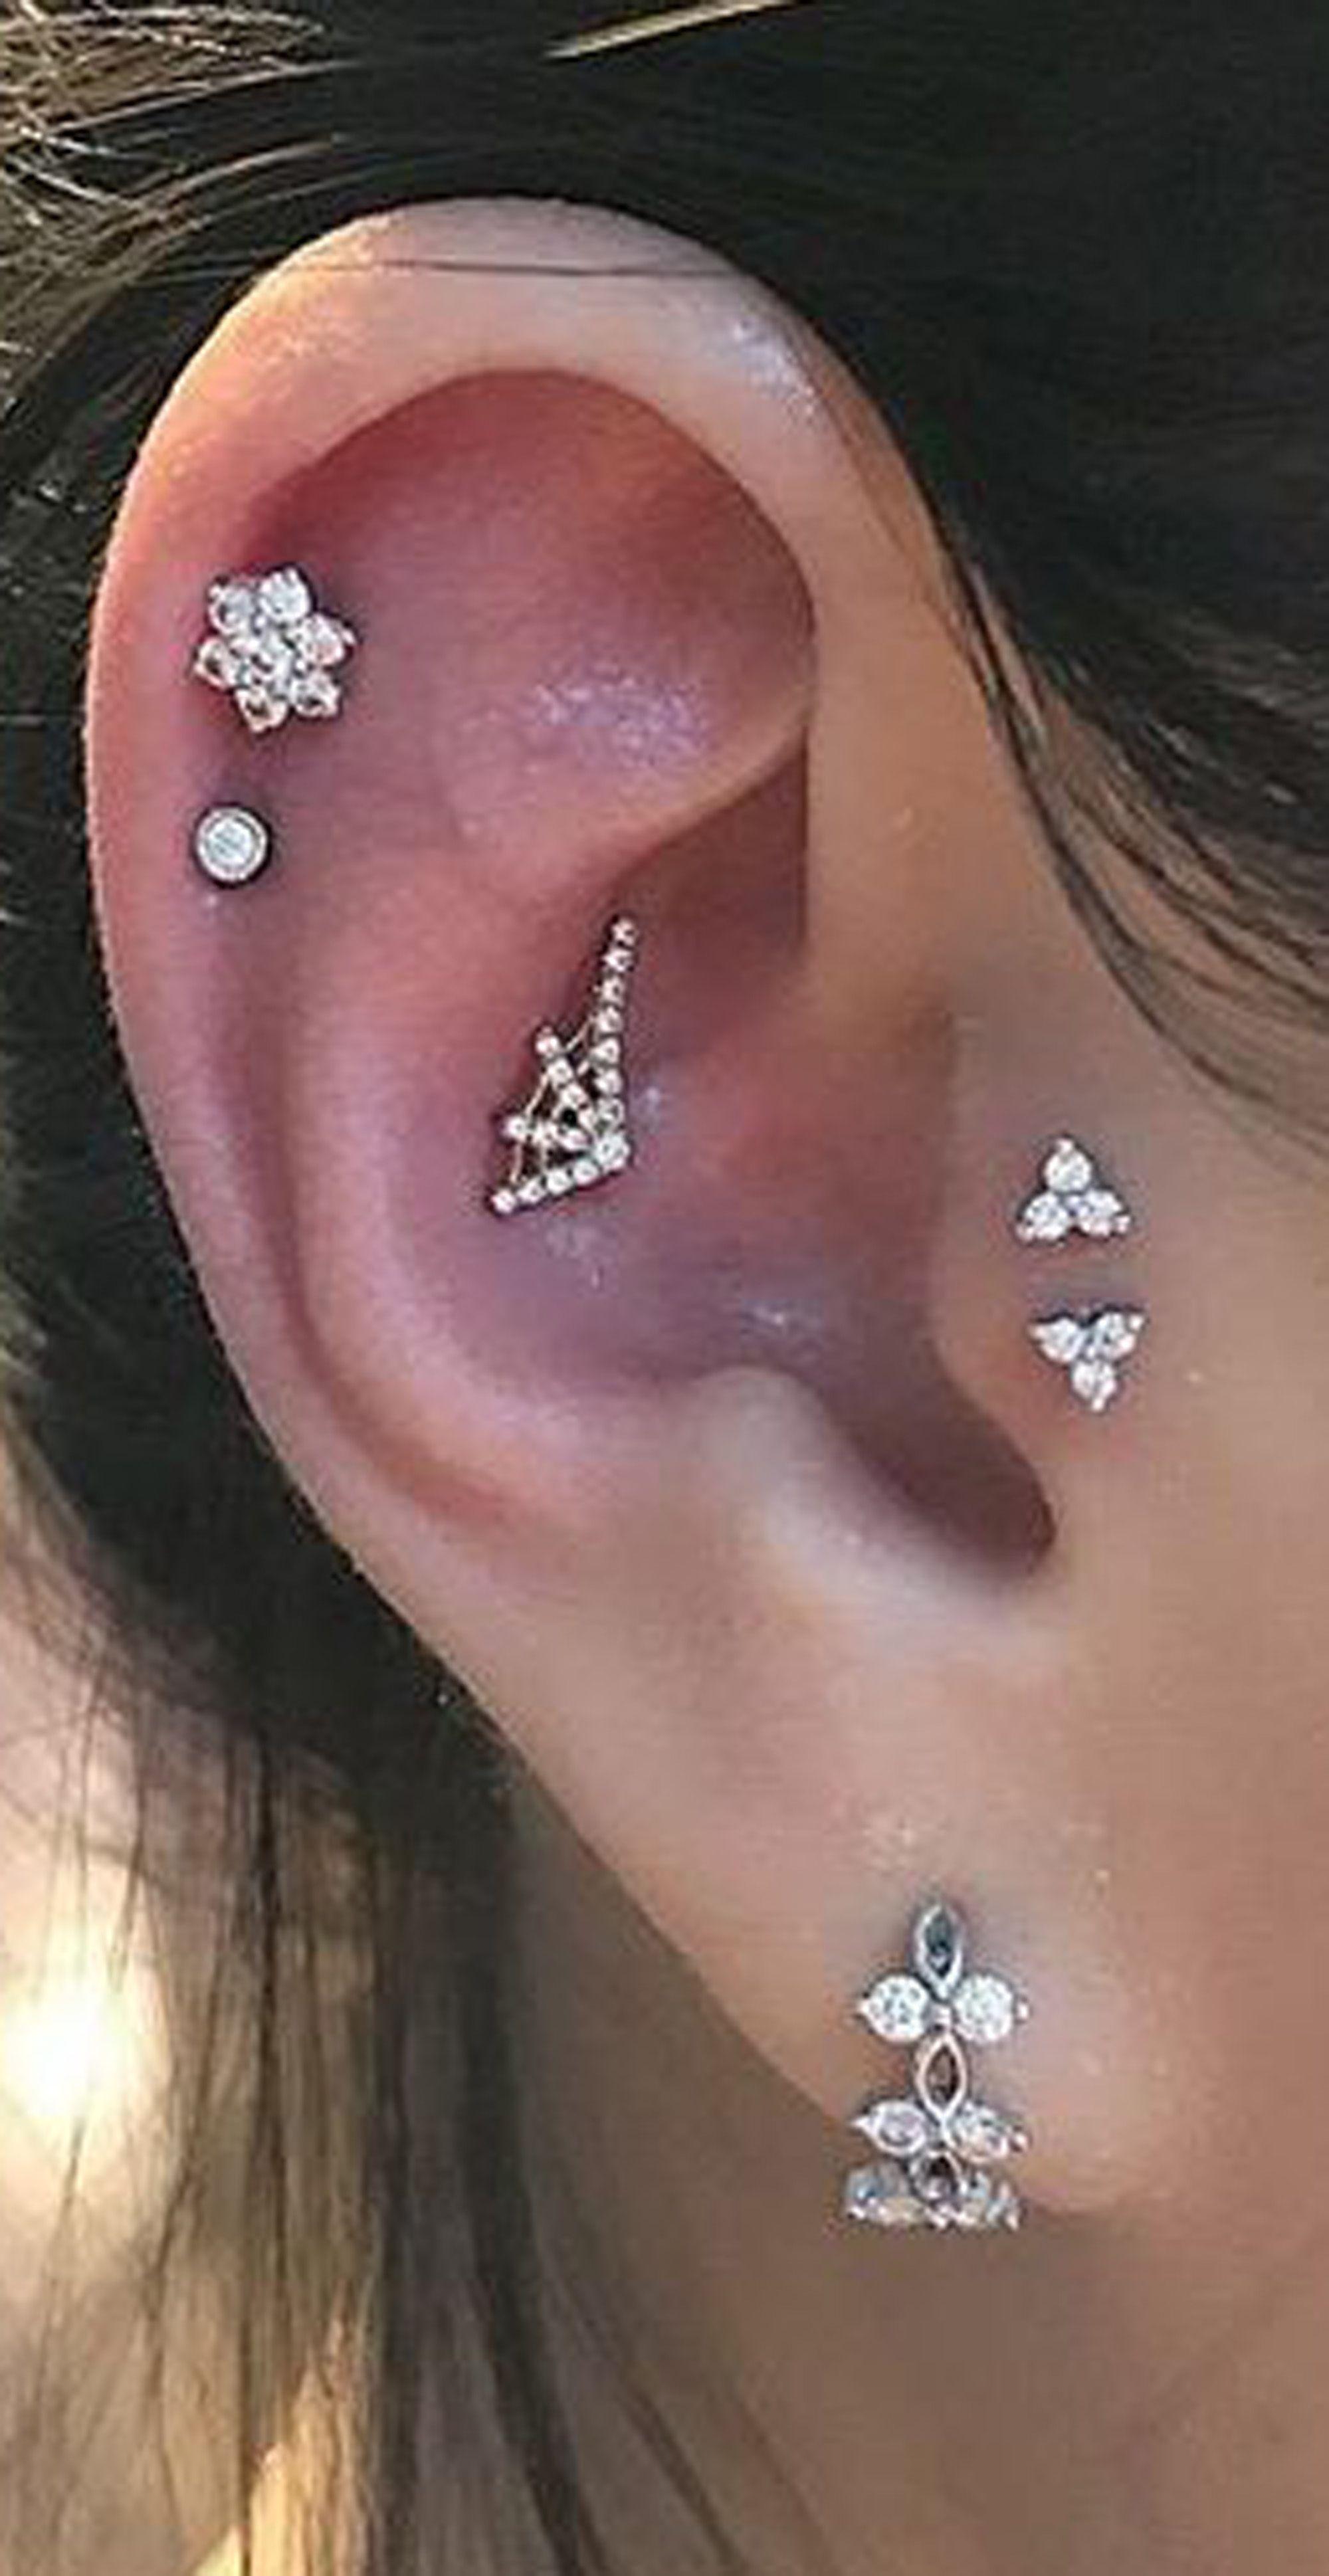 High nose piercing  cute multiple ear piercing ideas for women pretty crystal flower